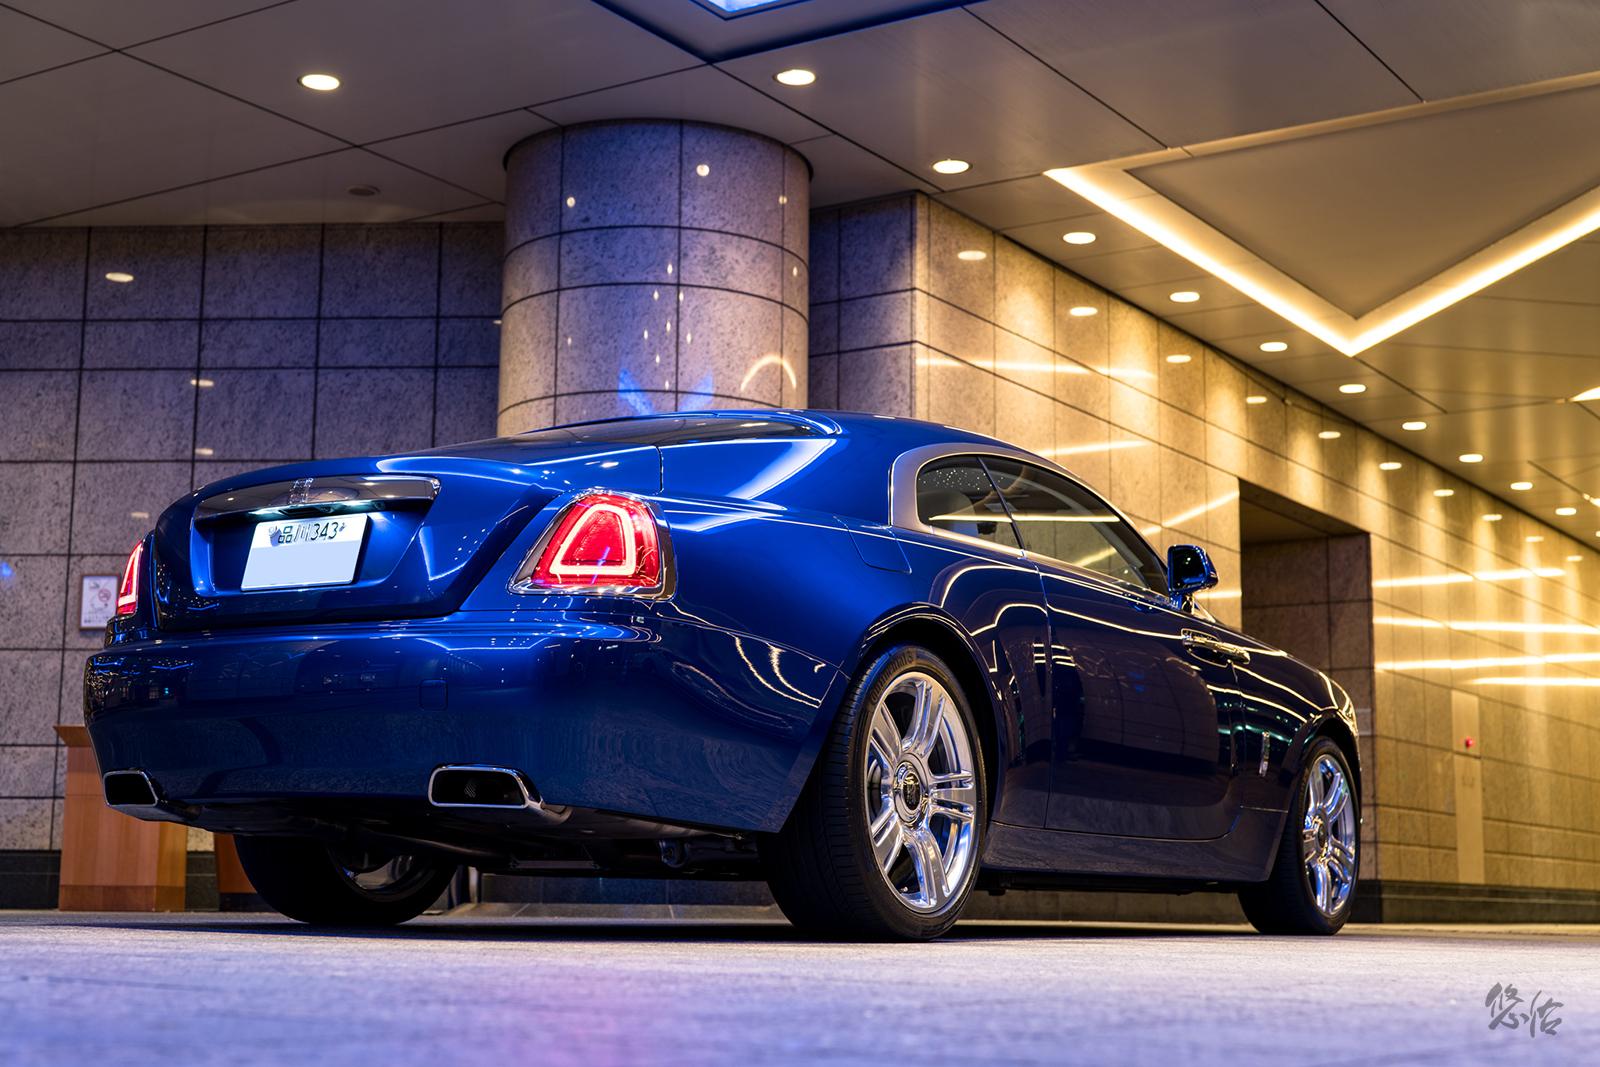 Rolls-Royce - Wraith - PHOTO By YUSUKE -